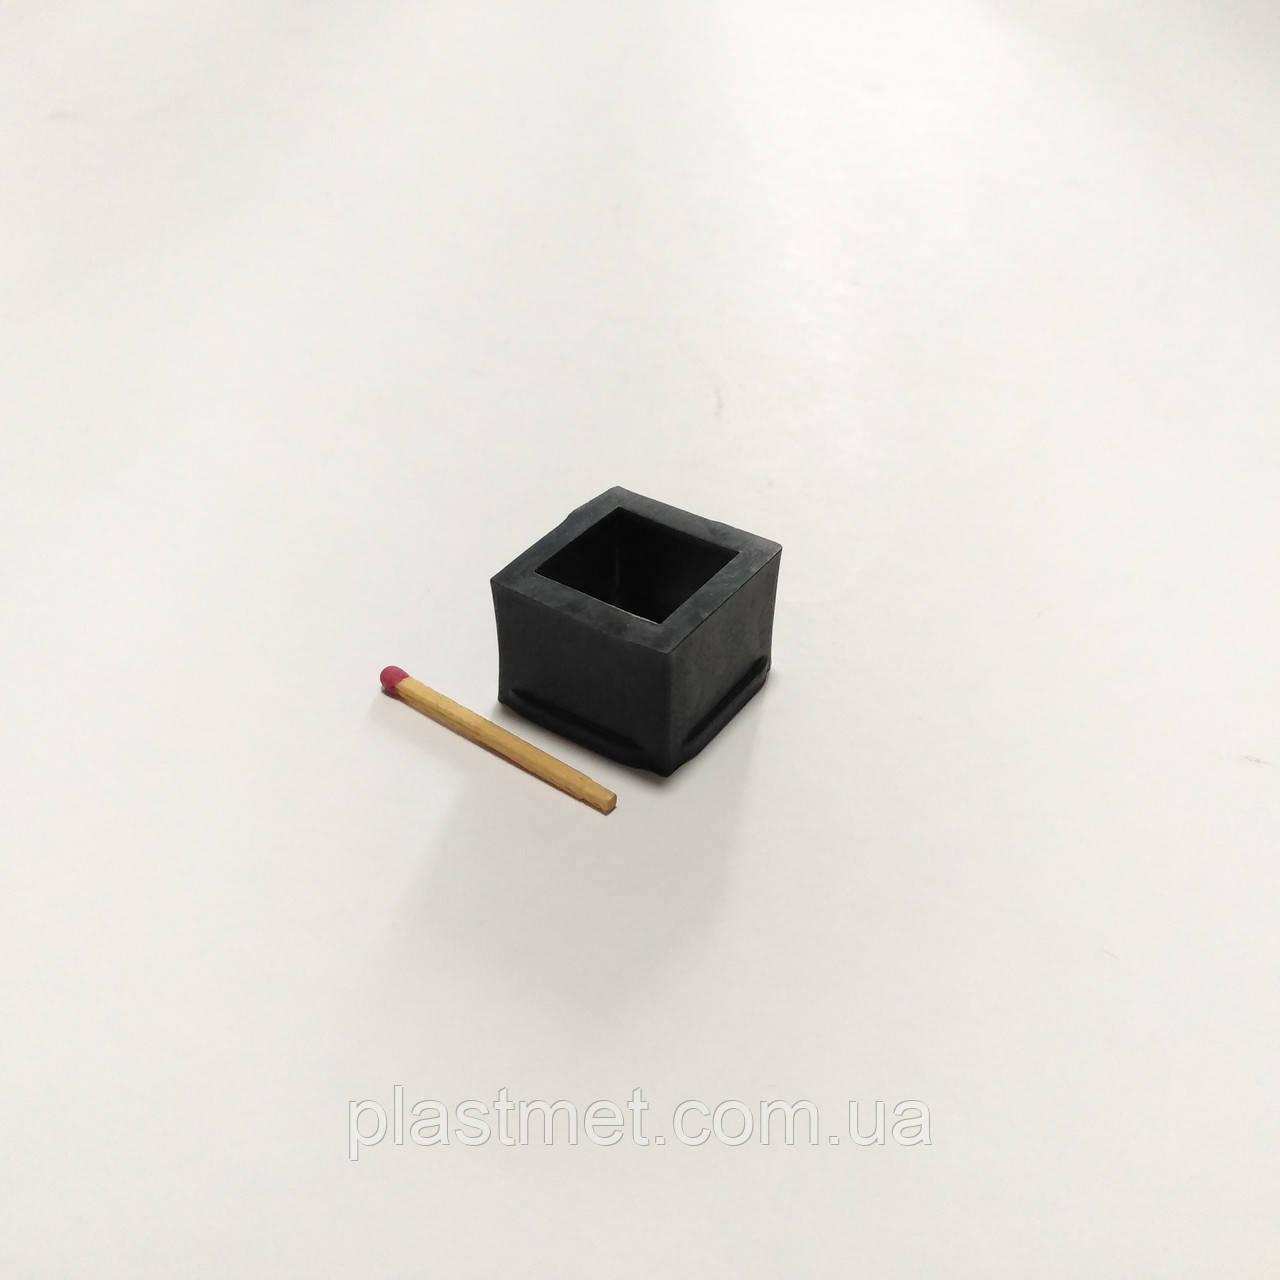 Заглушка переходная с 25х25 на 20х20 мм